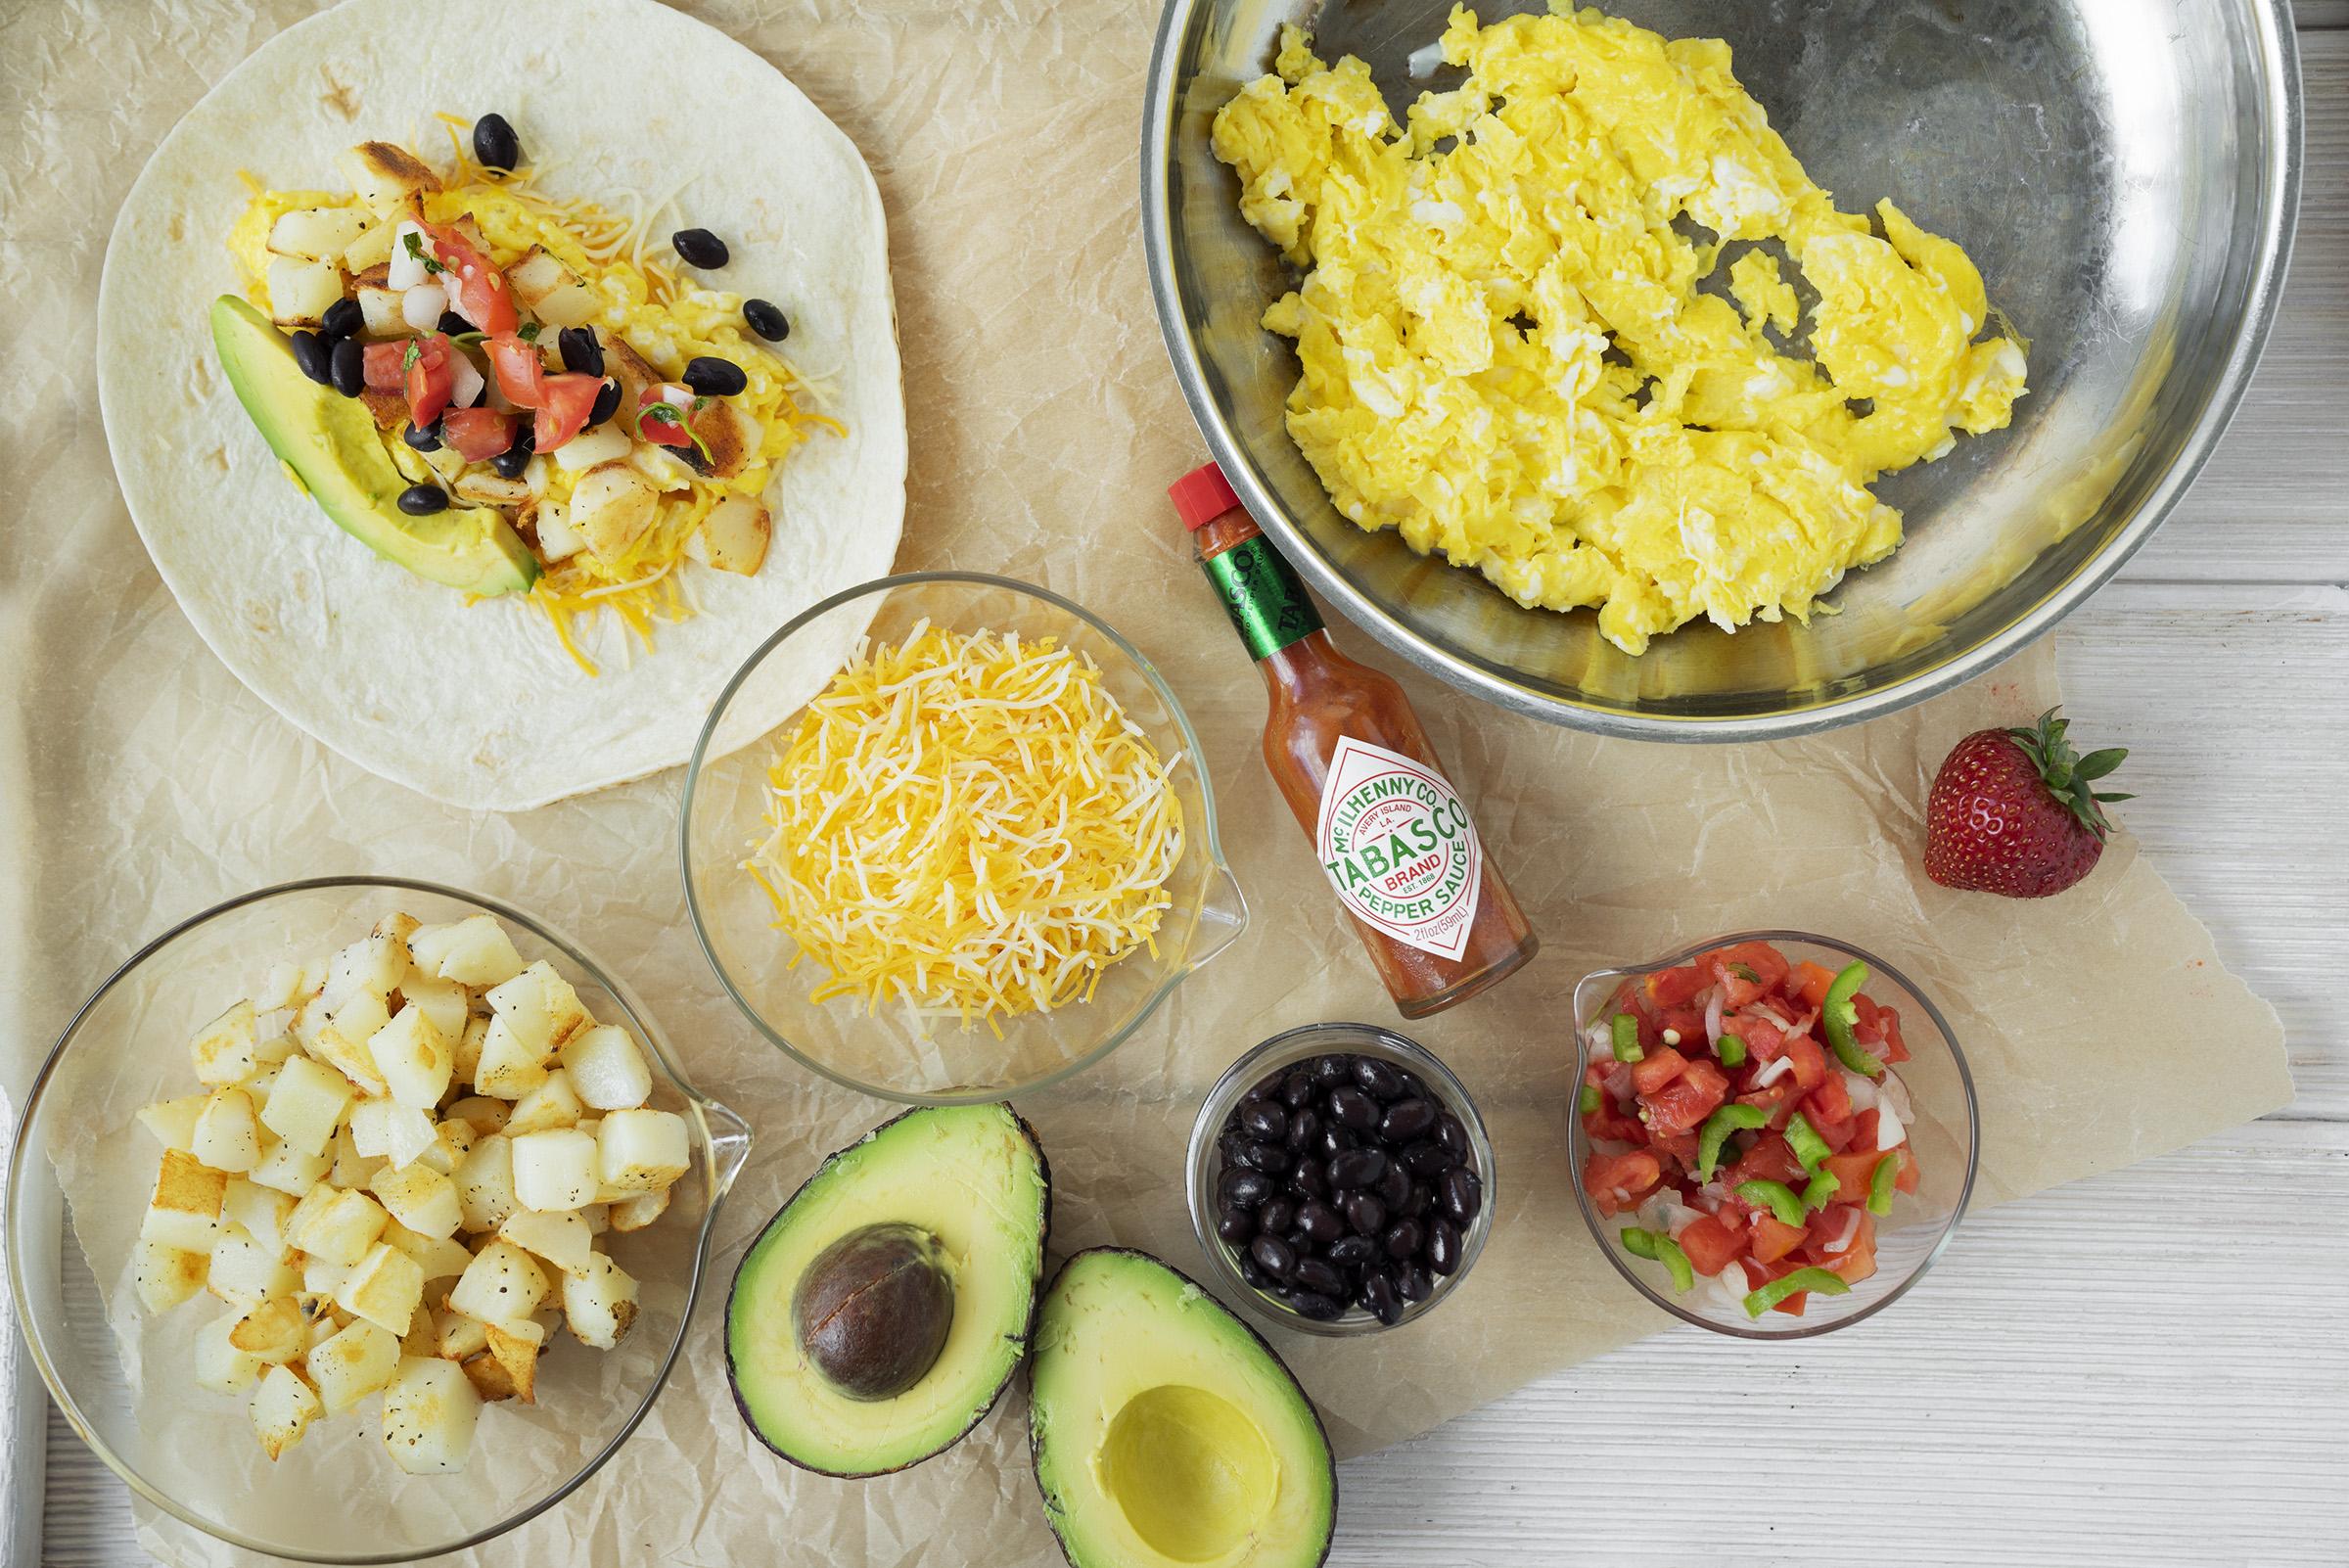 Best Breakfast Burritos and ingredients